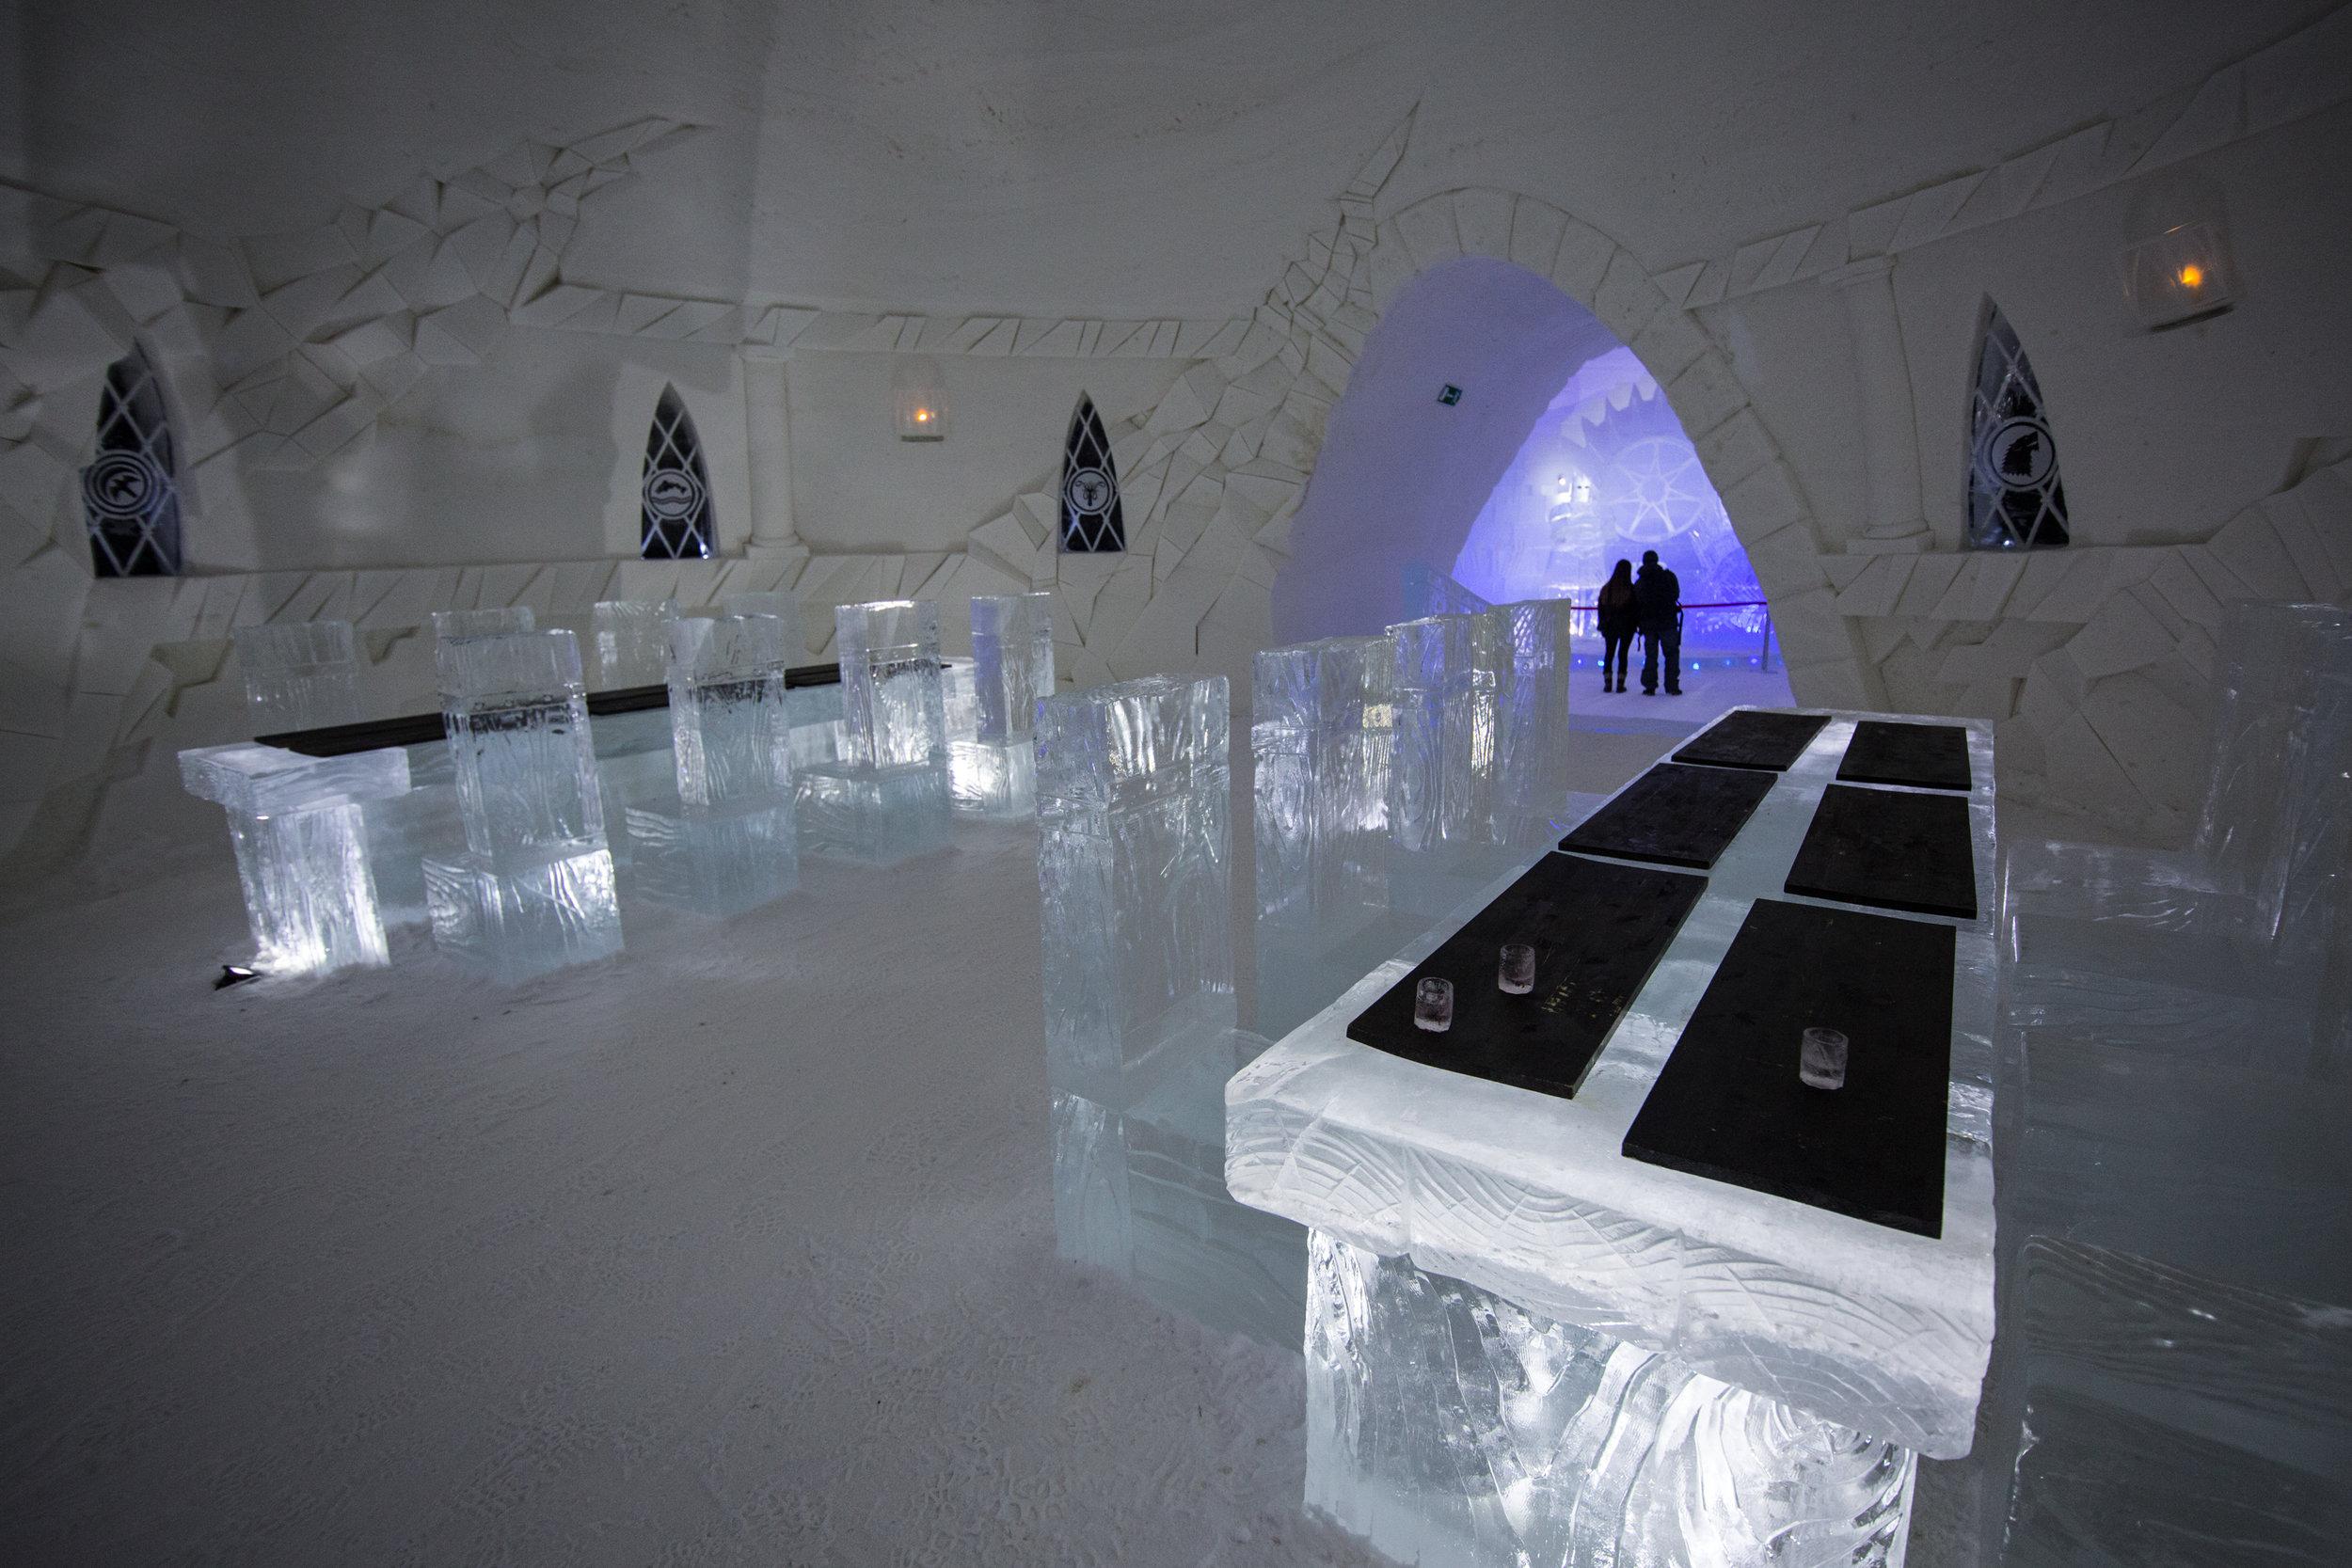 (c) Lapland Hotels Snow Village